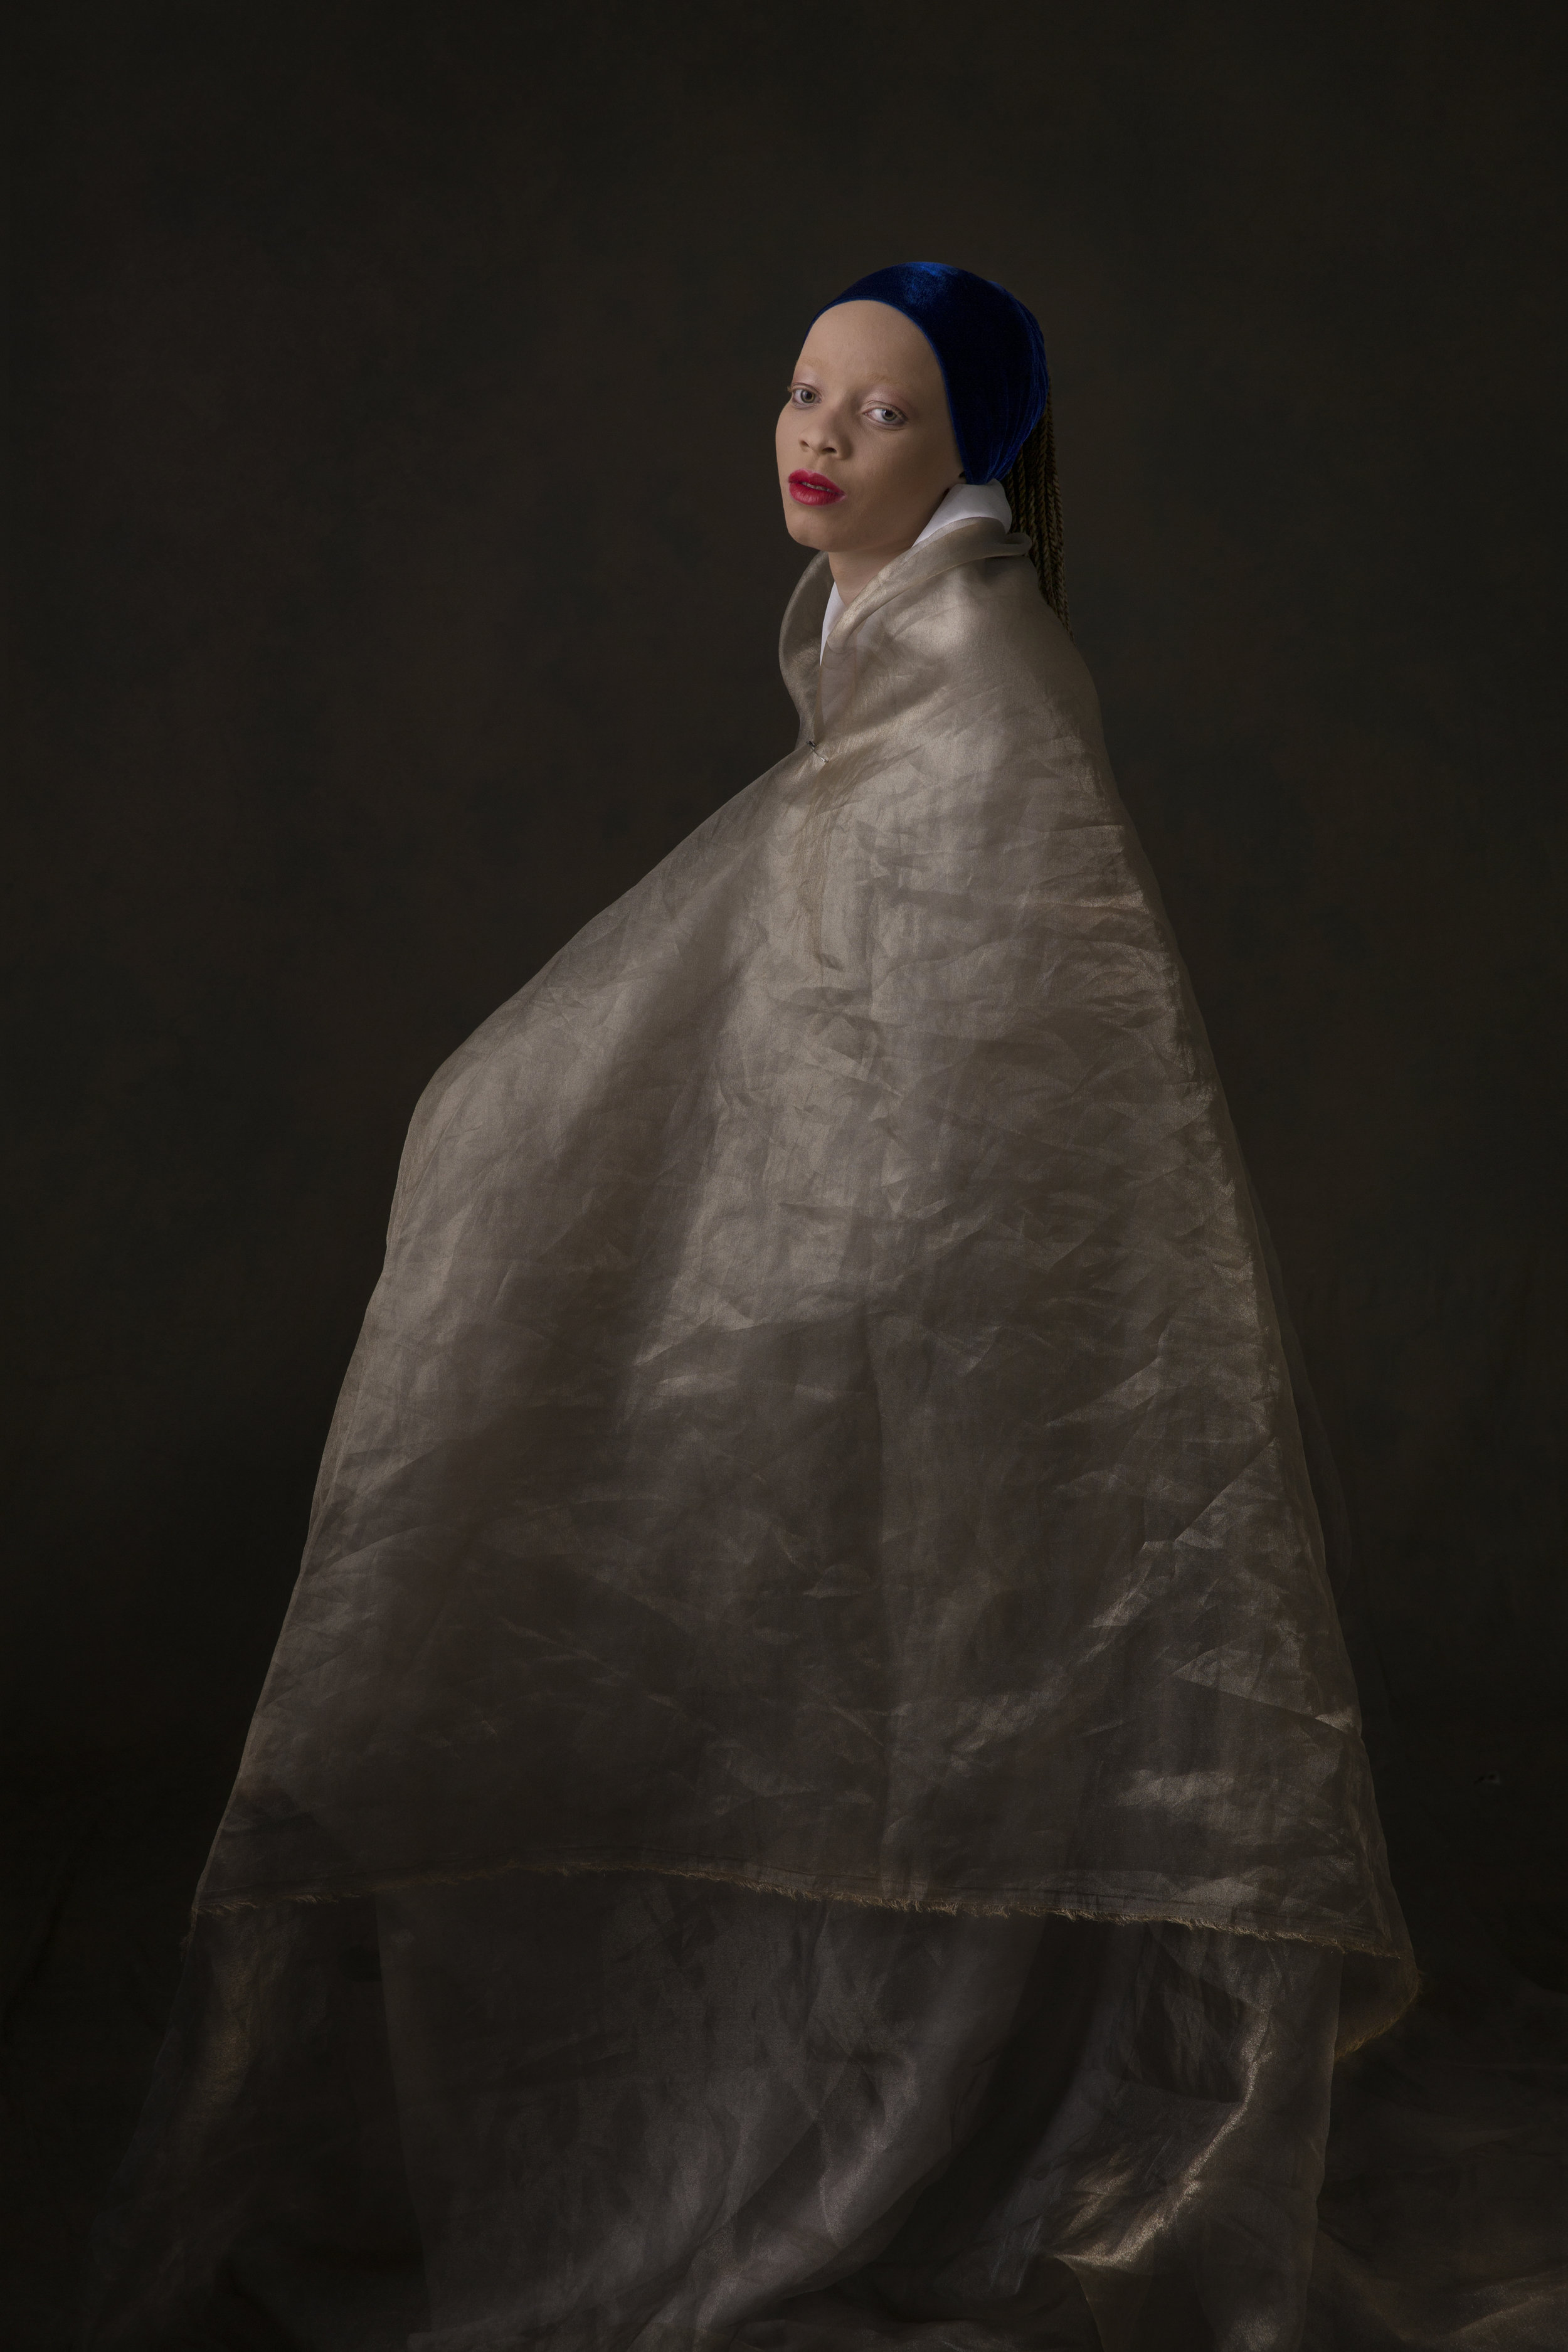 The Girl With Blue Scarf By Yetunde Ayeni-Babaeko